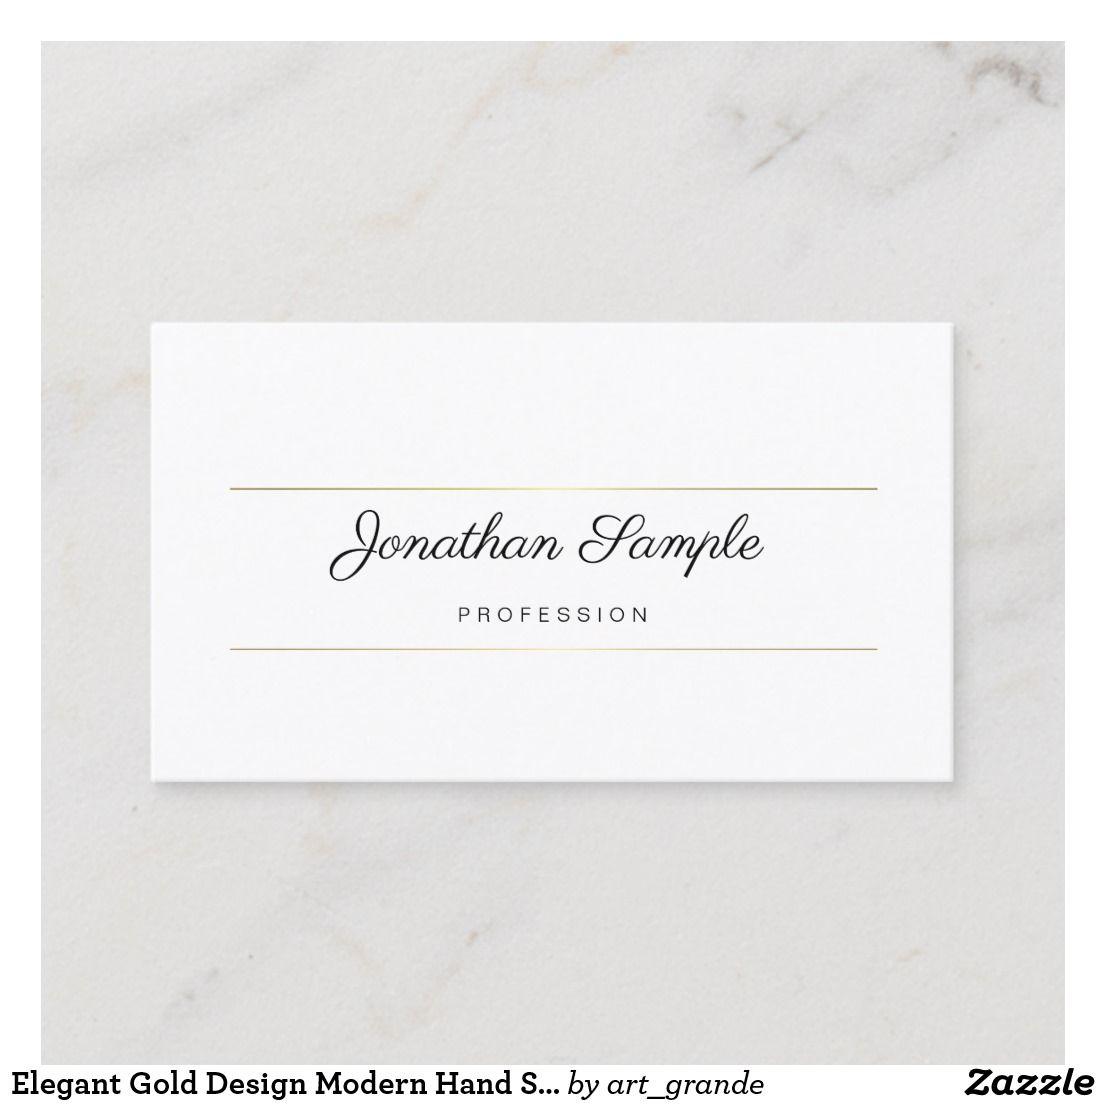 Elegant Gold Design Modern Hand Script Template Business